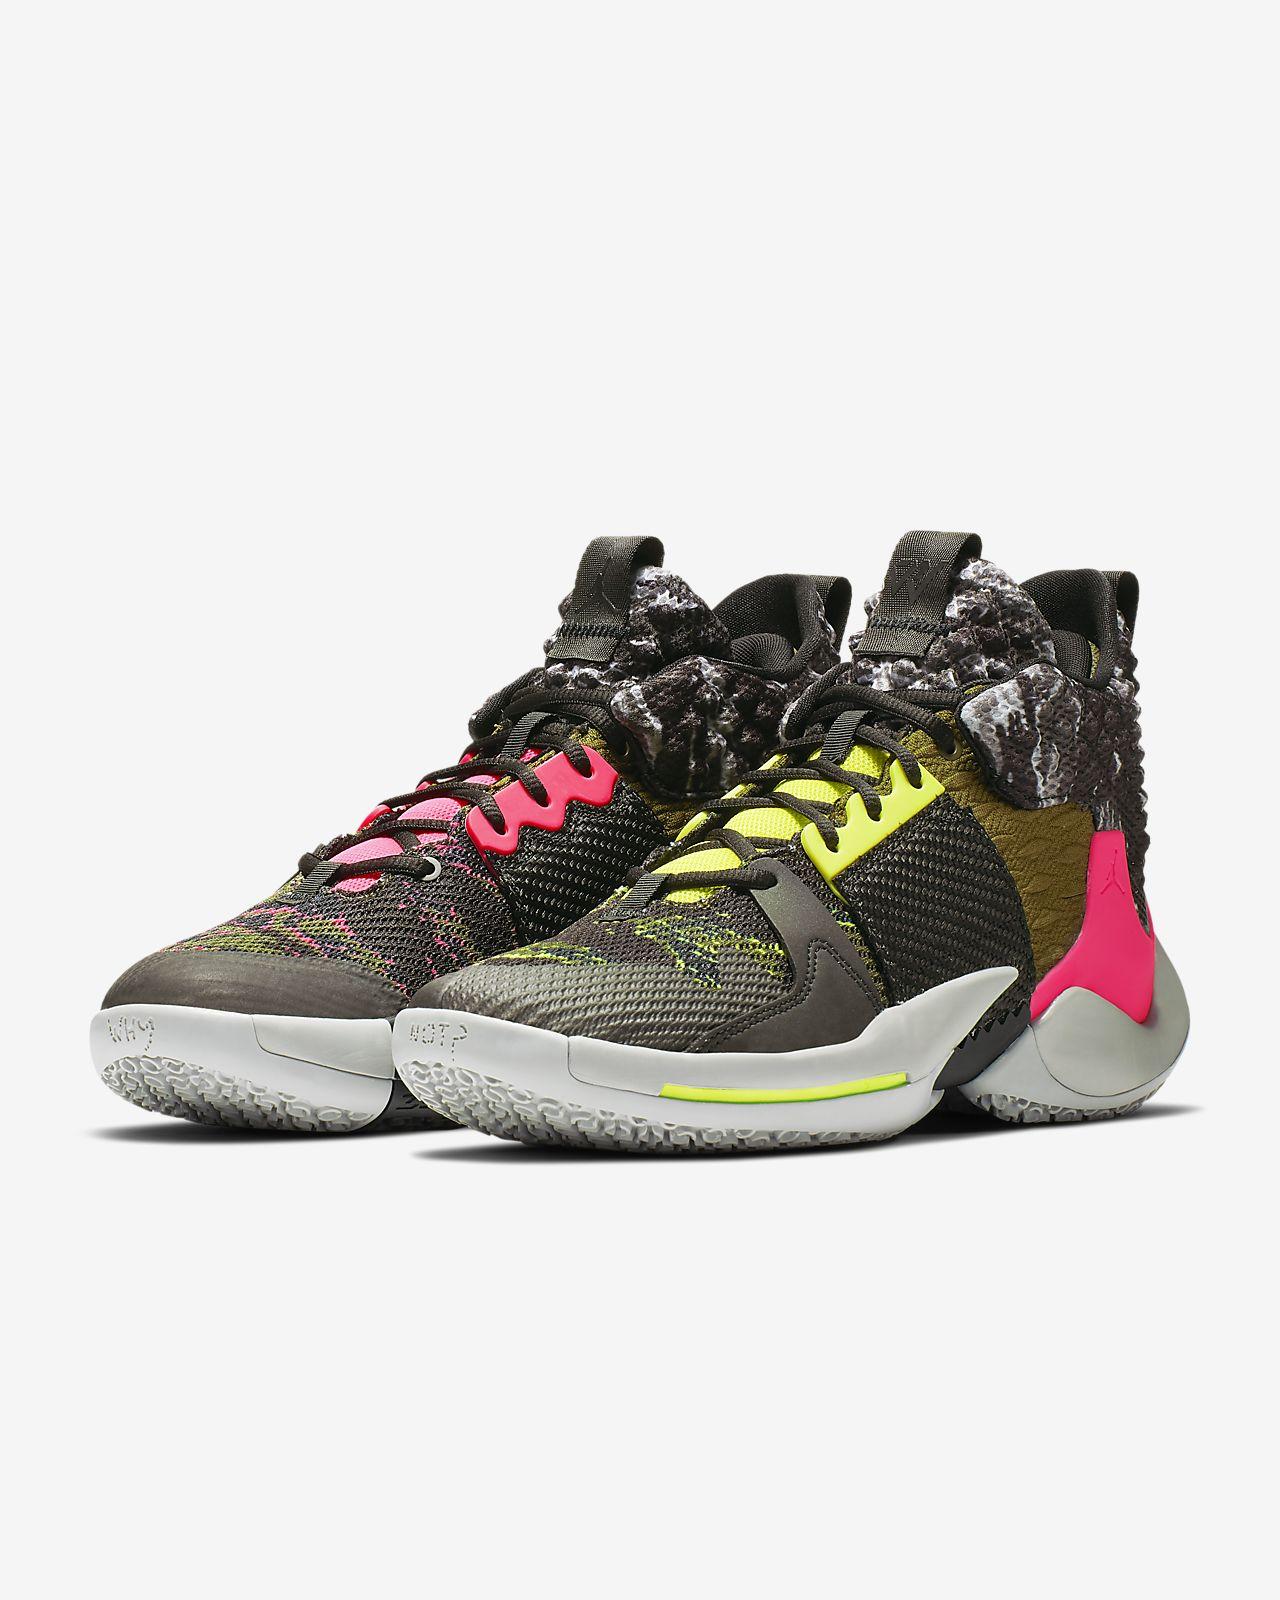 Zer0 Shoe Not 2 Basketball 'why ' Jordan TiPXuOkZ